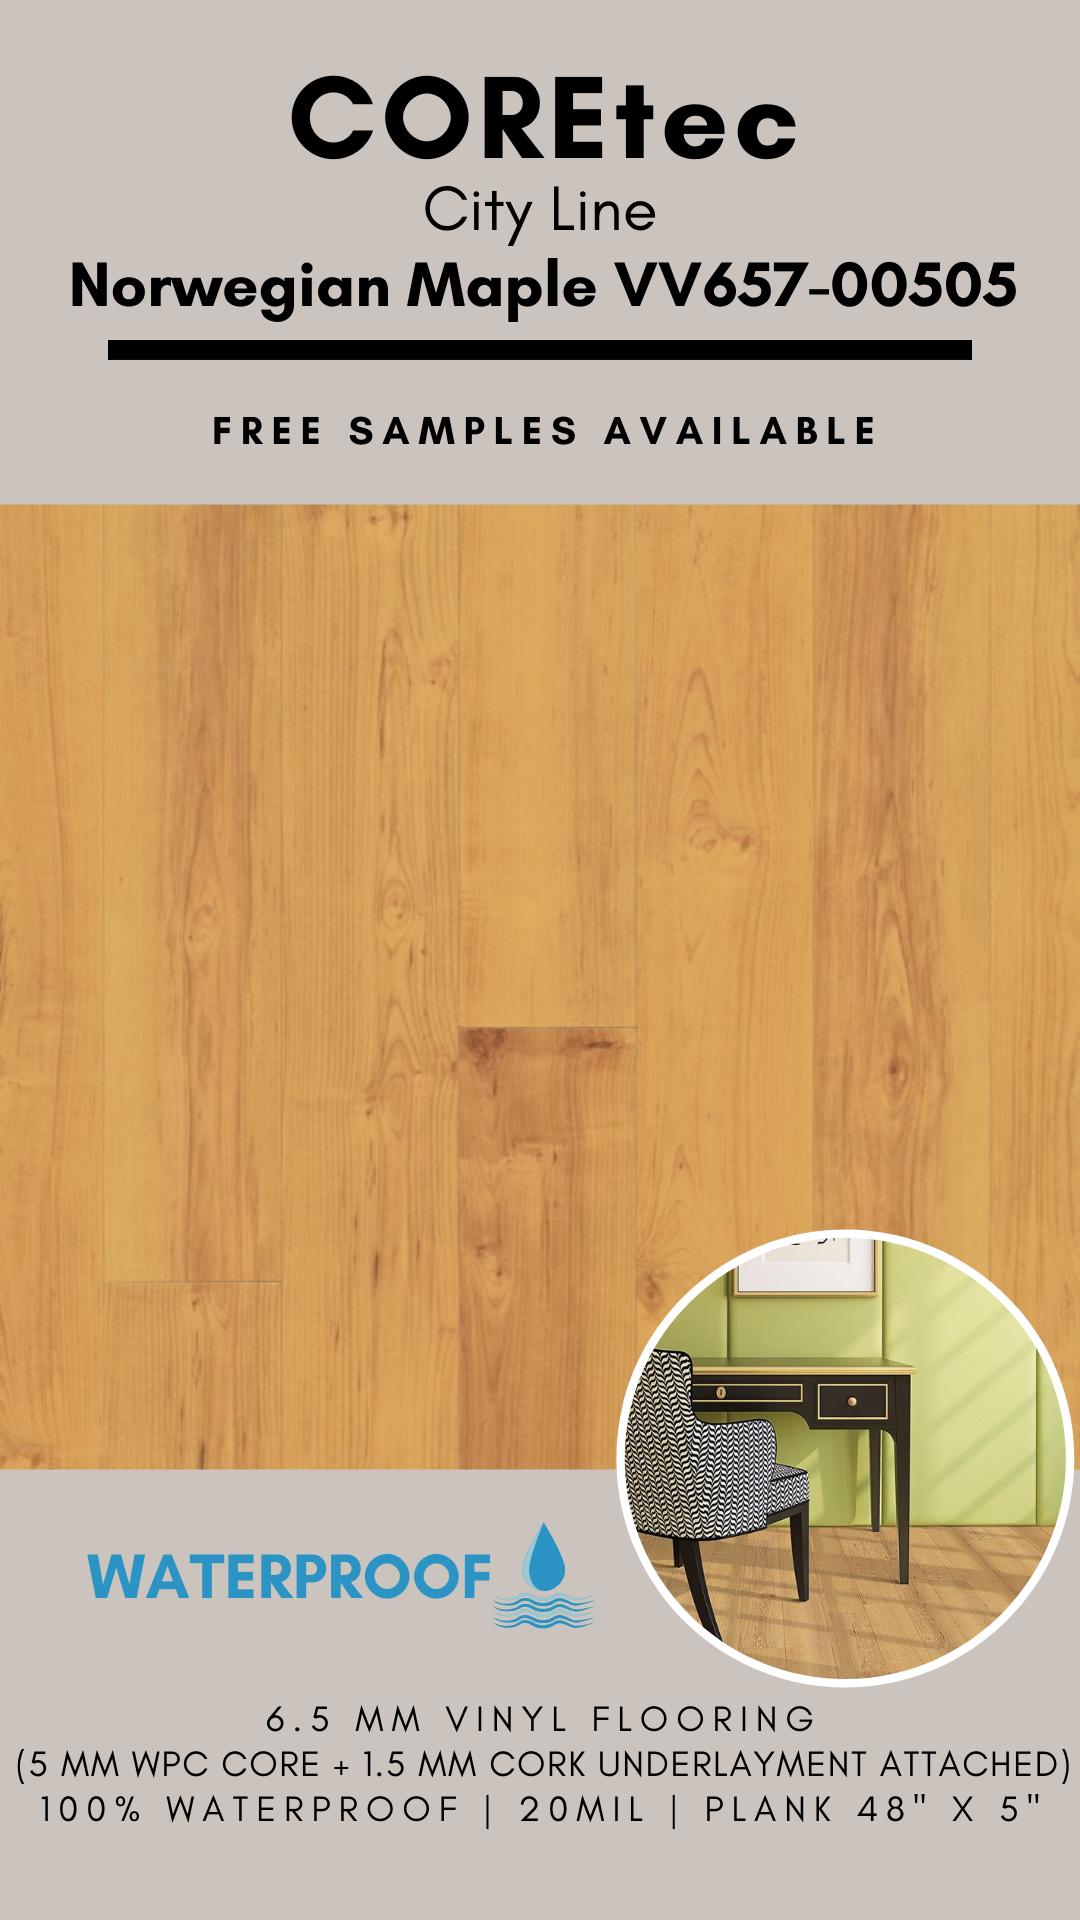 Coretec Plus 5 Wpc City Line Plank Norwegian Maple Vv657 00505 Vinyl Flooring Special Buy In 2020 Vinyl Flooring Coretec Plus Flooring Flooring